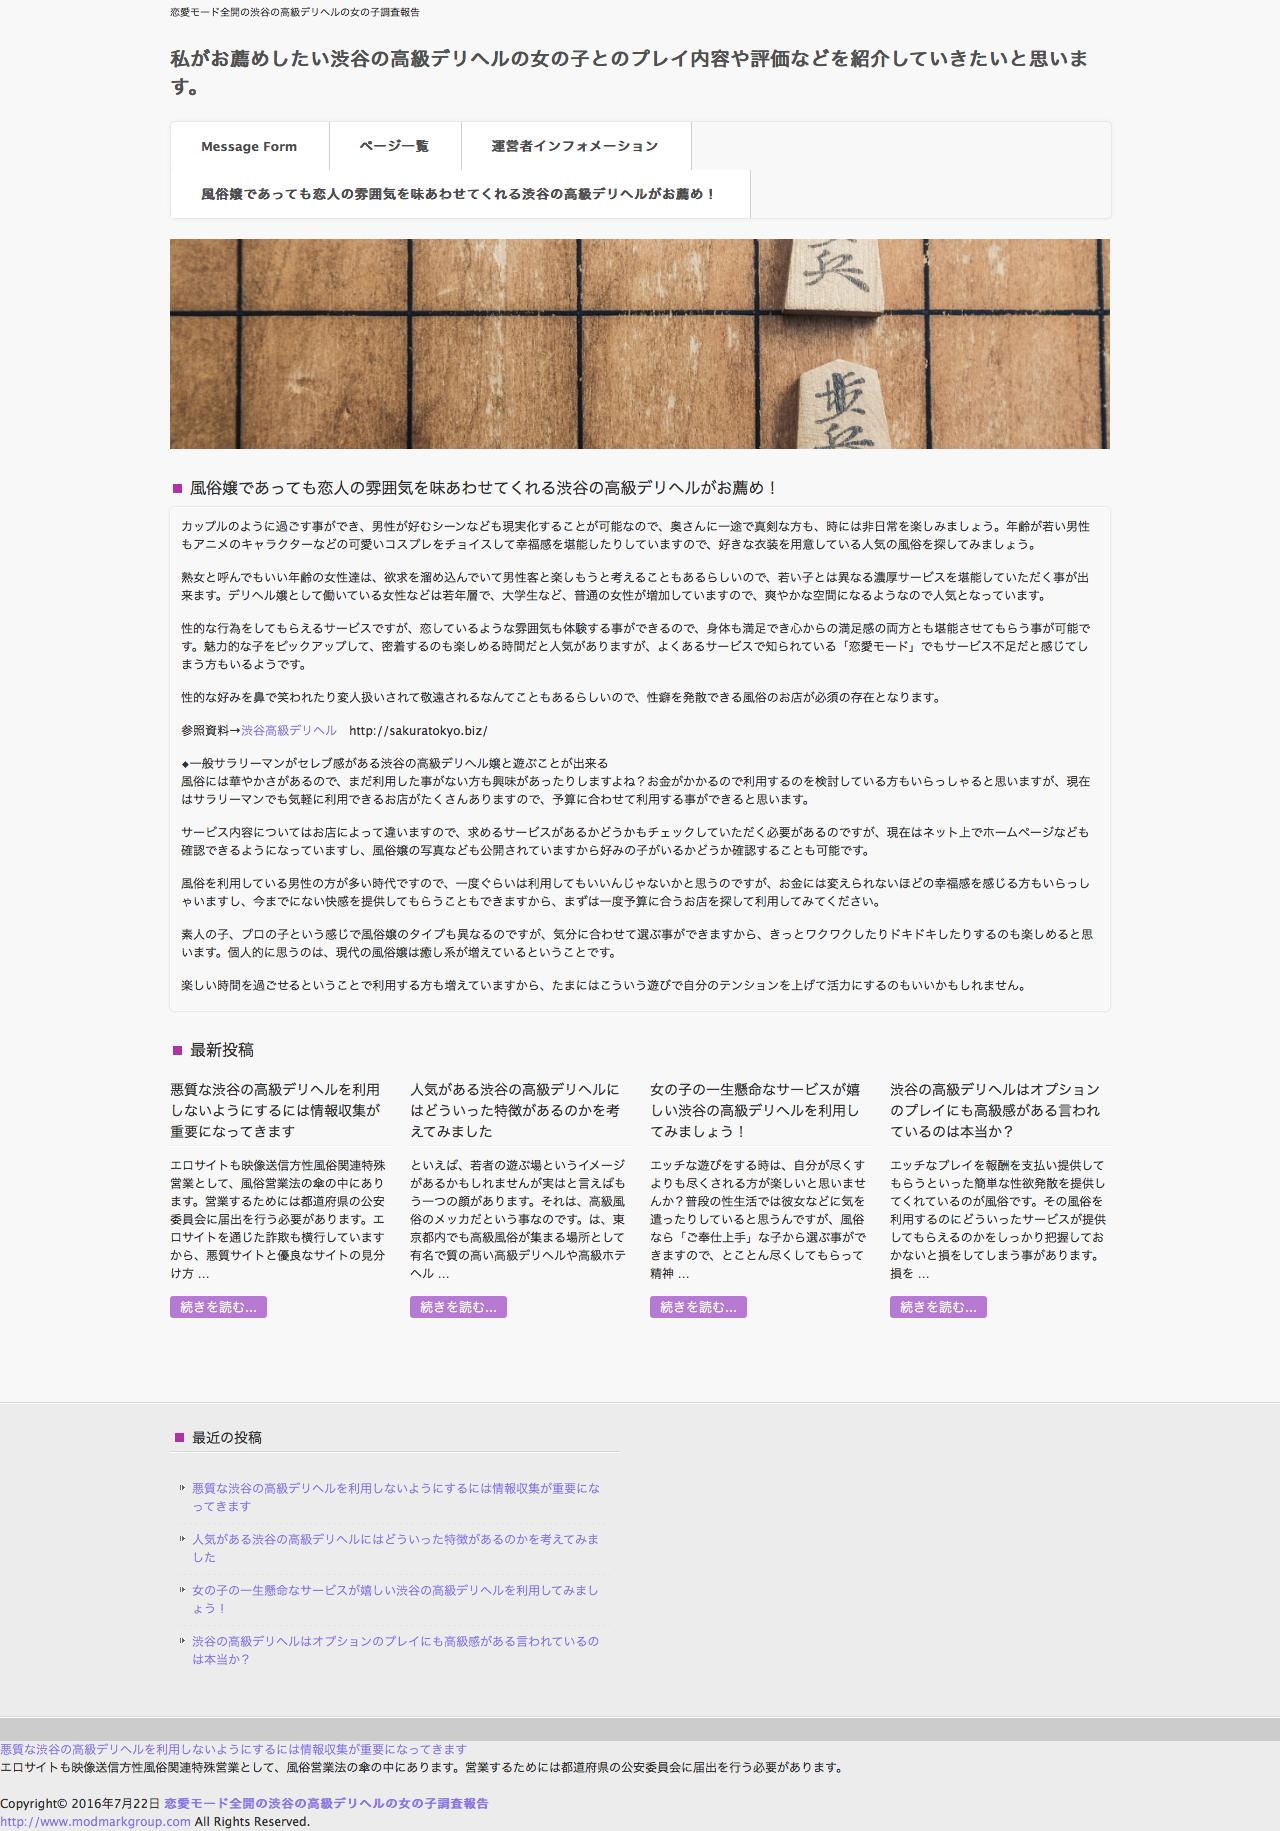 Screenshot of modmarkgroup.com - 風俗嬢であっても恋人の雰囲気を味あわせてくれる渋谷の高級デリヘルがお薦め! - captured Dec. 17, 2016